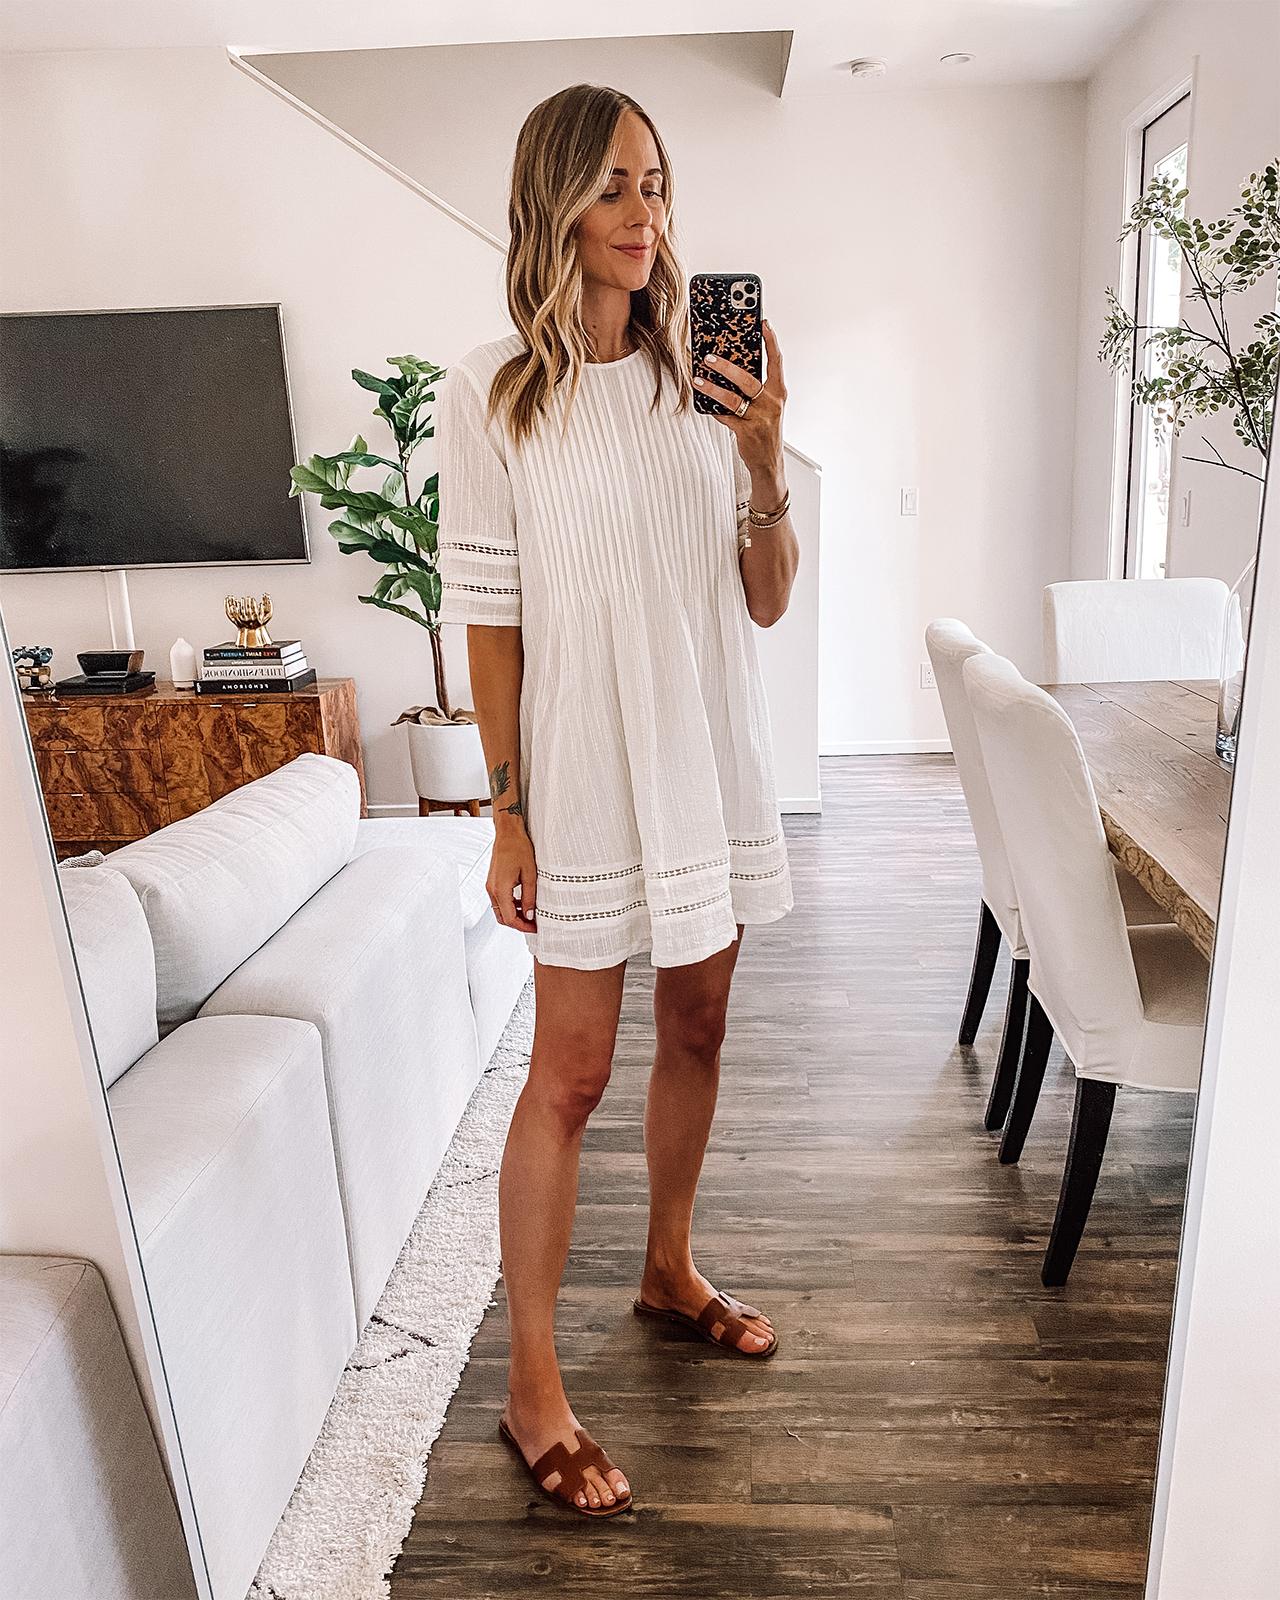 Fashion Jackson Wearing White Pintuck Summer Dress